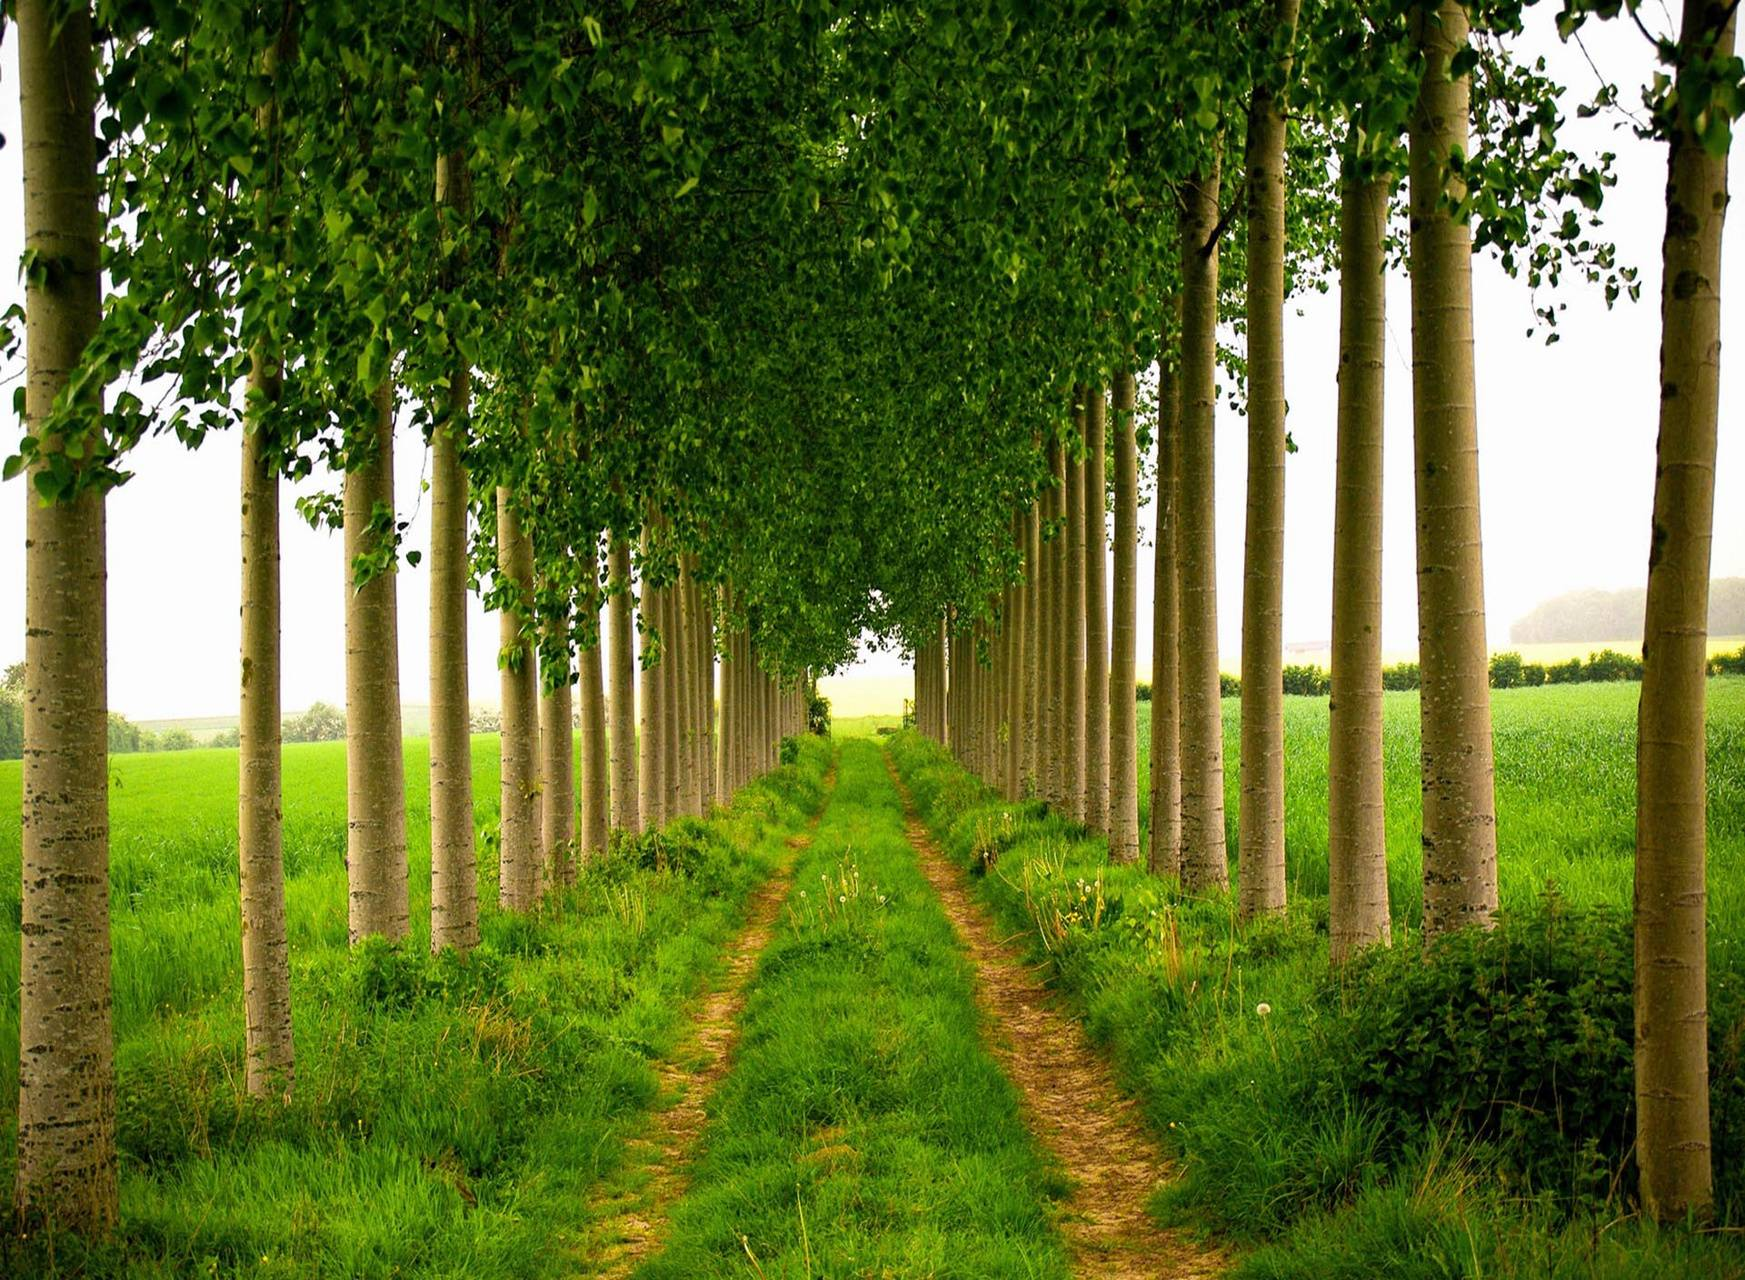 Landscapes trees